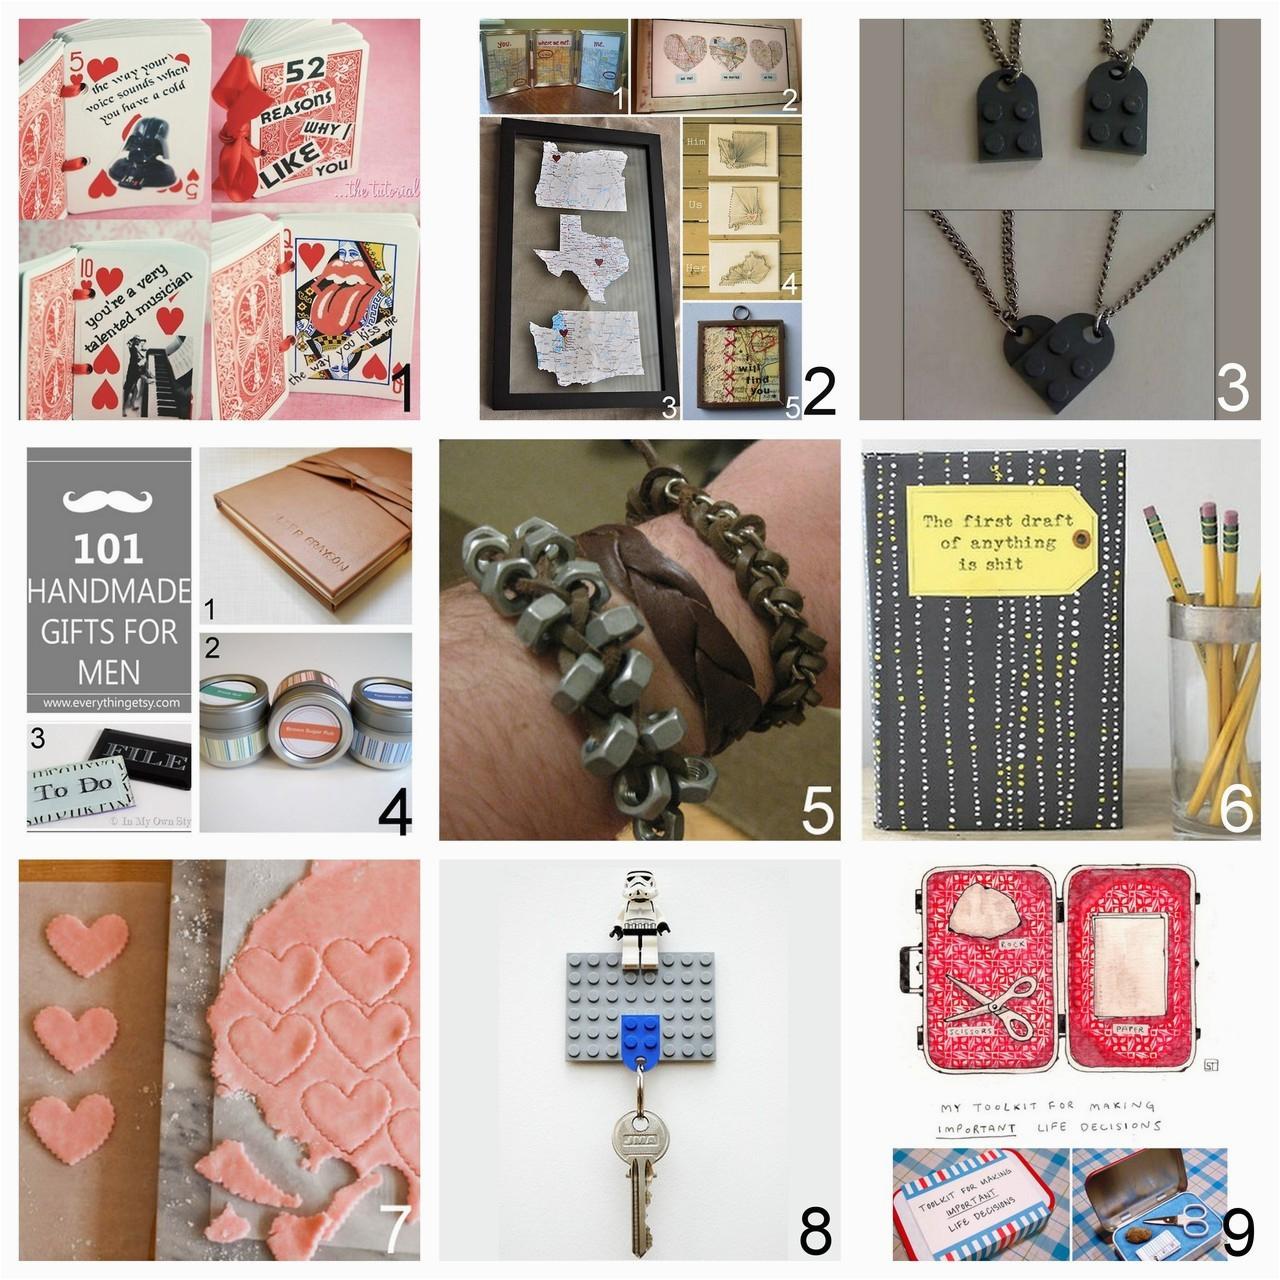 sweet gift ideas for boyfriend birthday